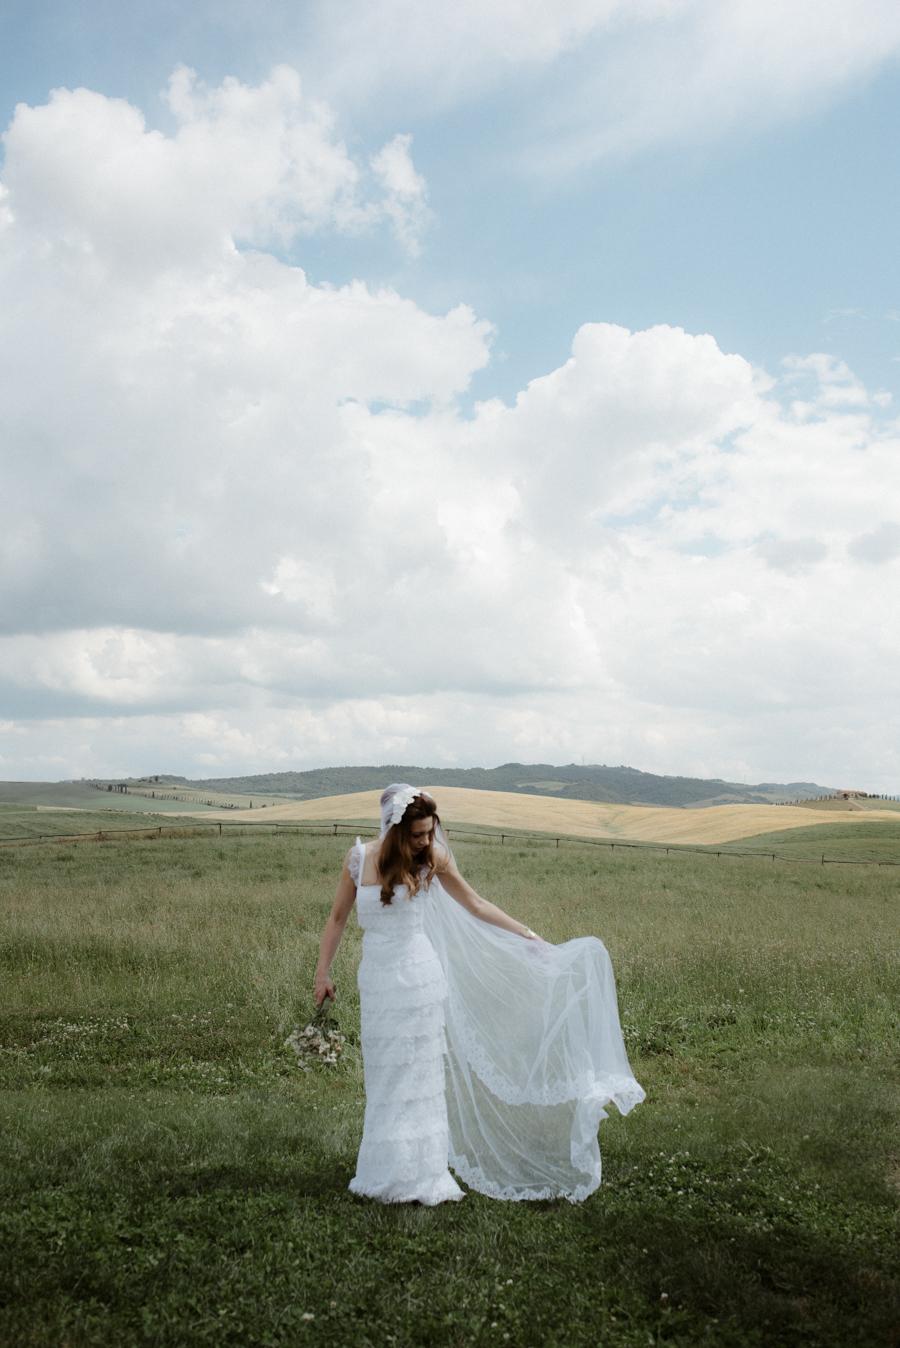 matrimonio-anni-70-sarinski-bianco-photography-10